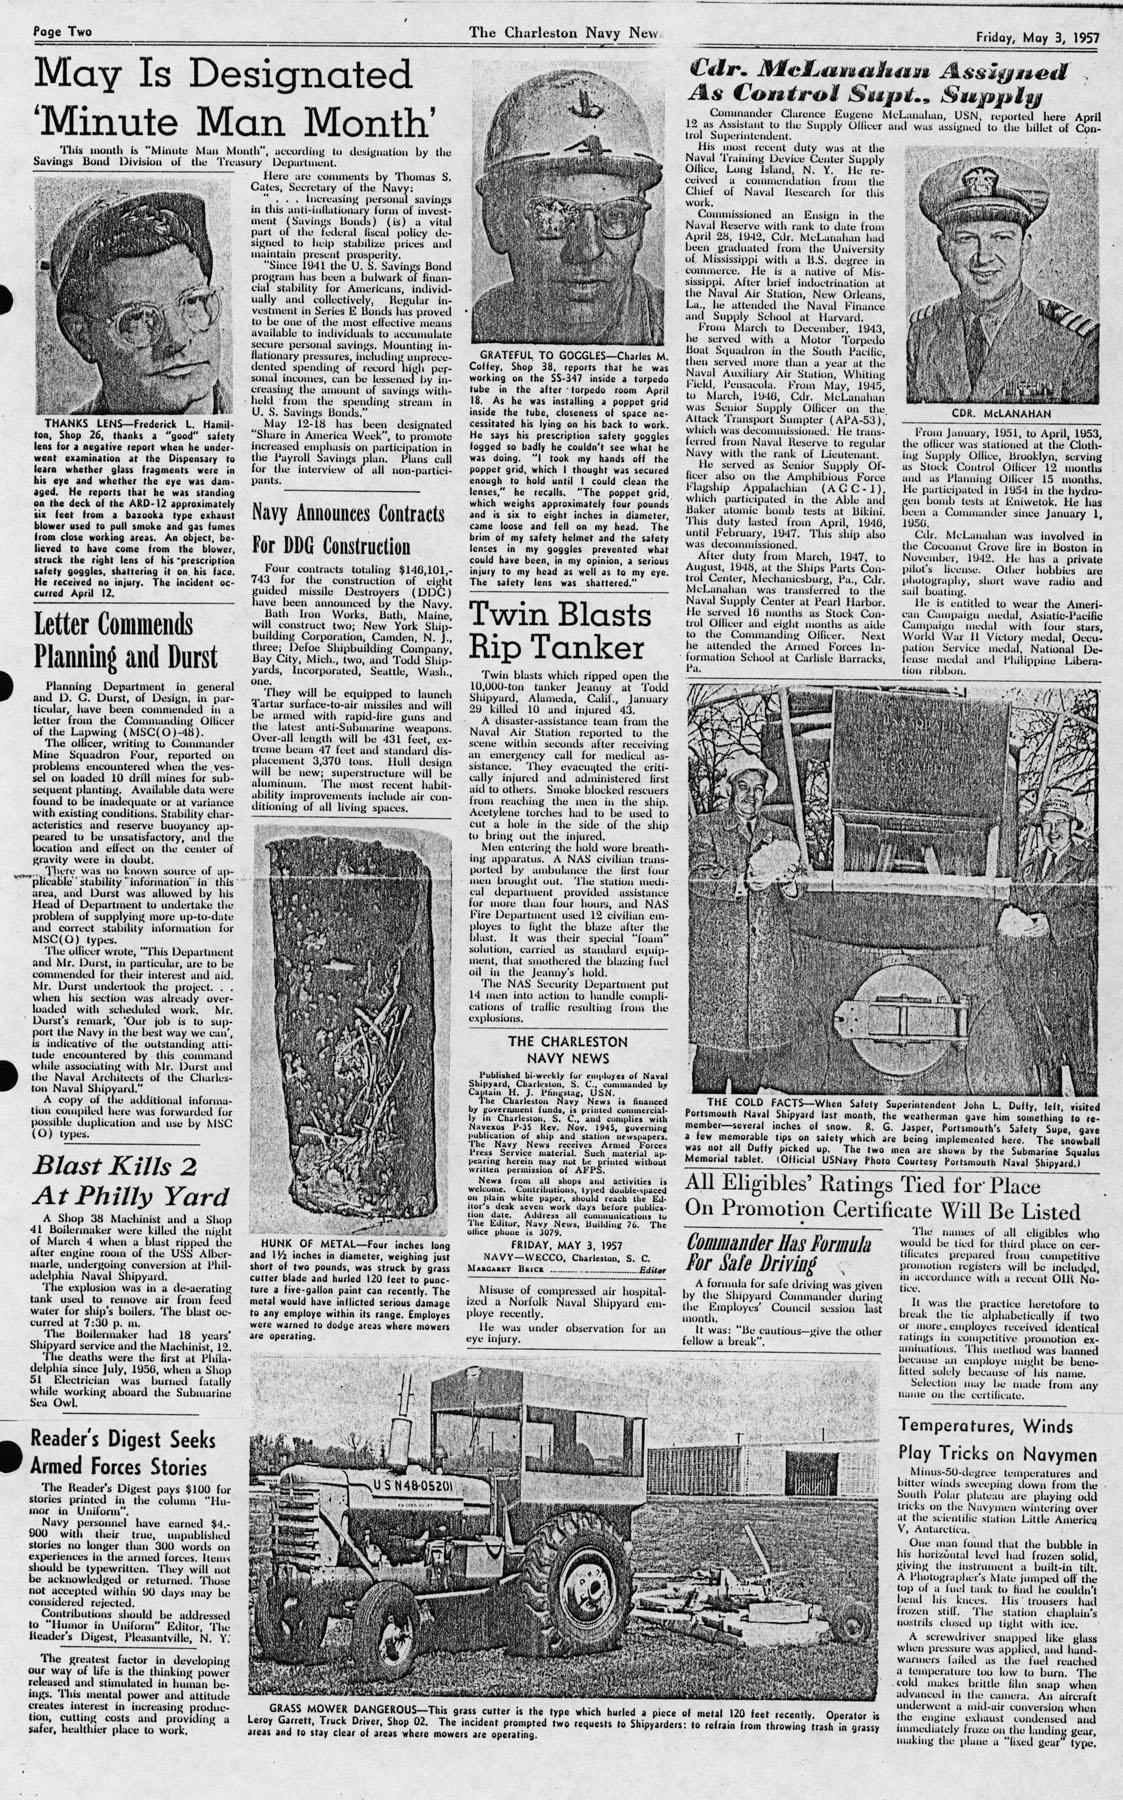 The Charleston Navy News, Volume 15, Edition 21, page ii